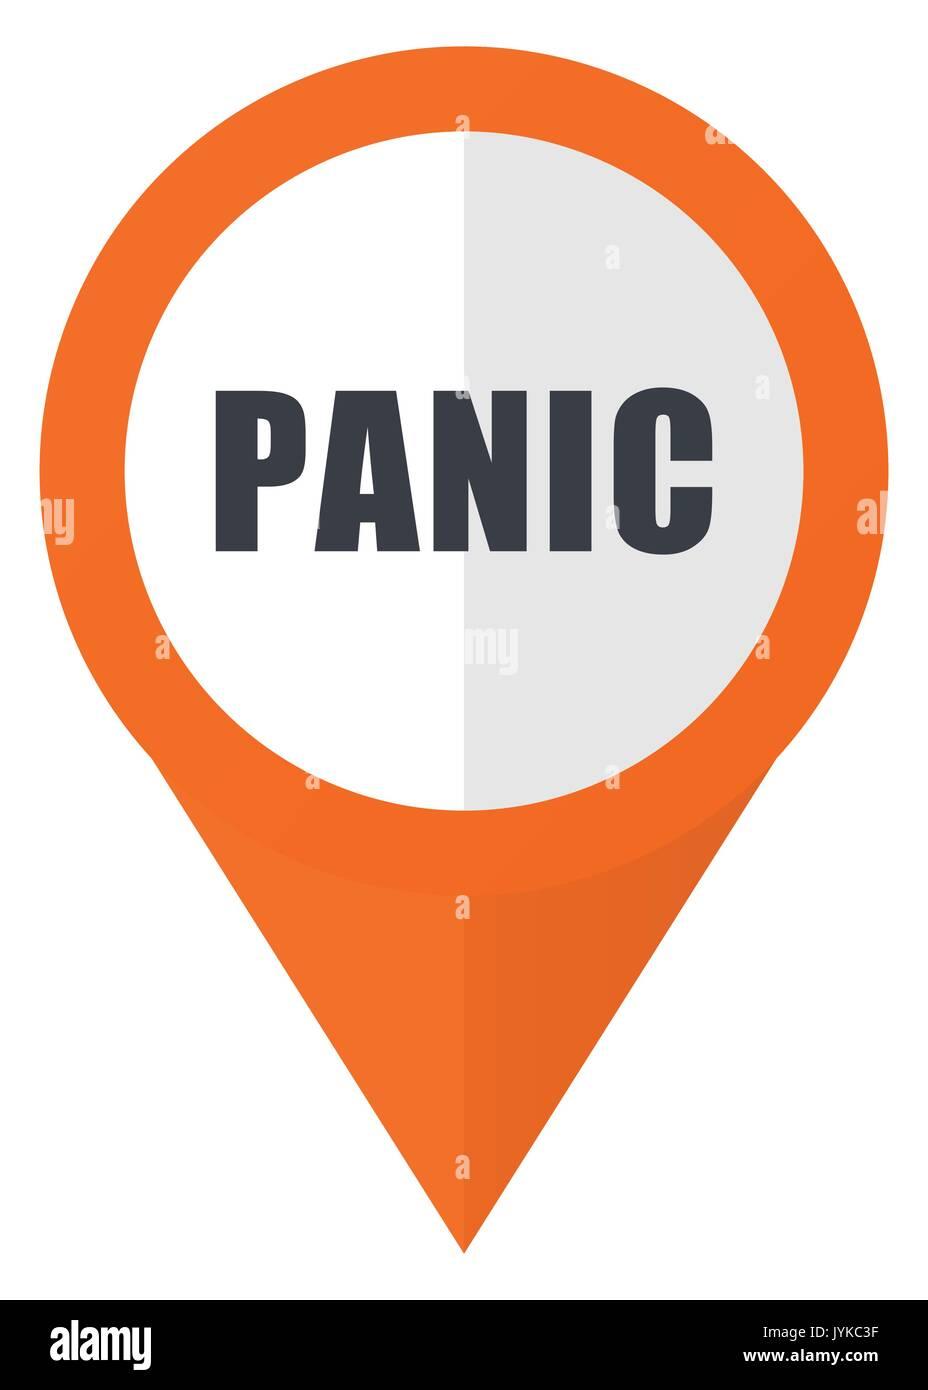 Panic orange pointer vector icon in eps 10 isolated on white background. - Stock Image